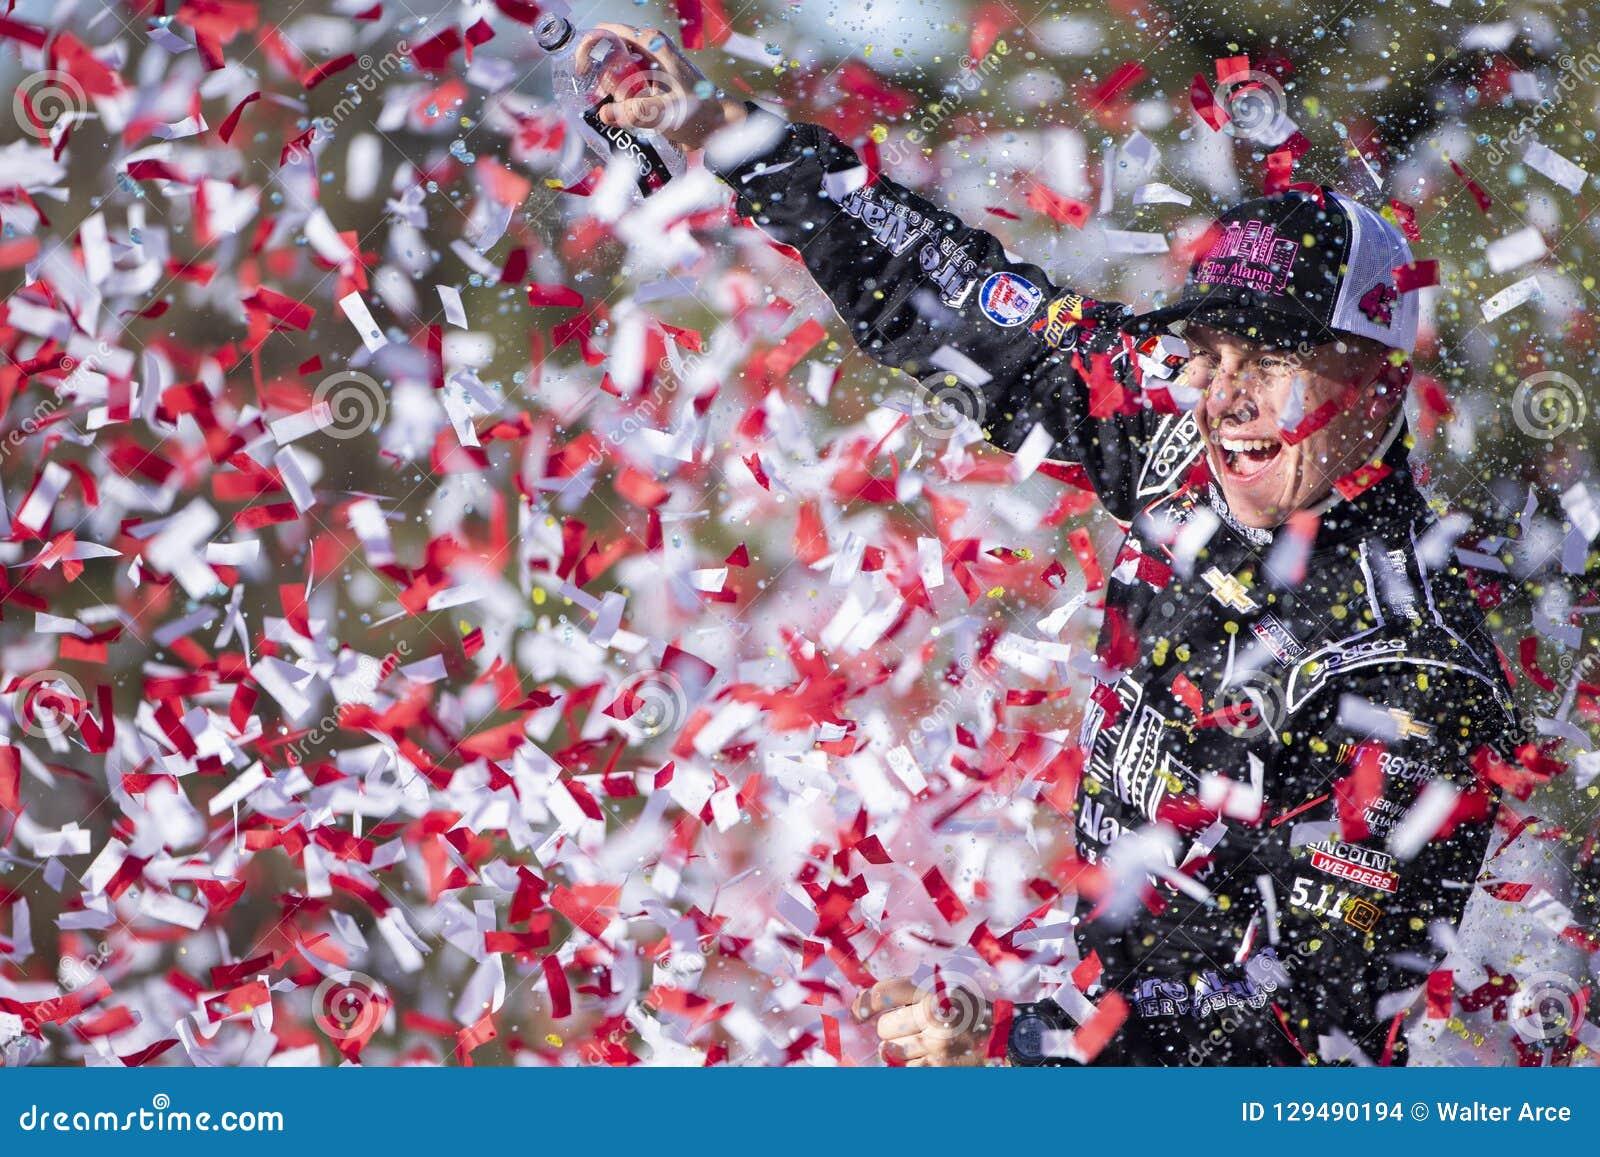 Nascar October 20 Kansas Lottery 300 Editorial Stock Image Image